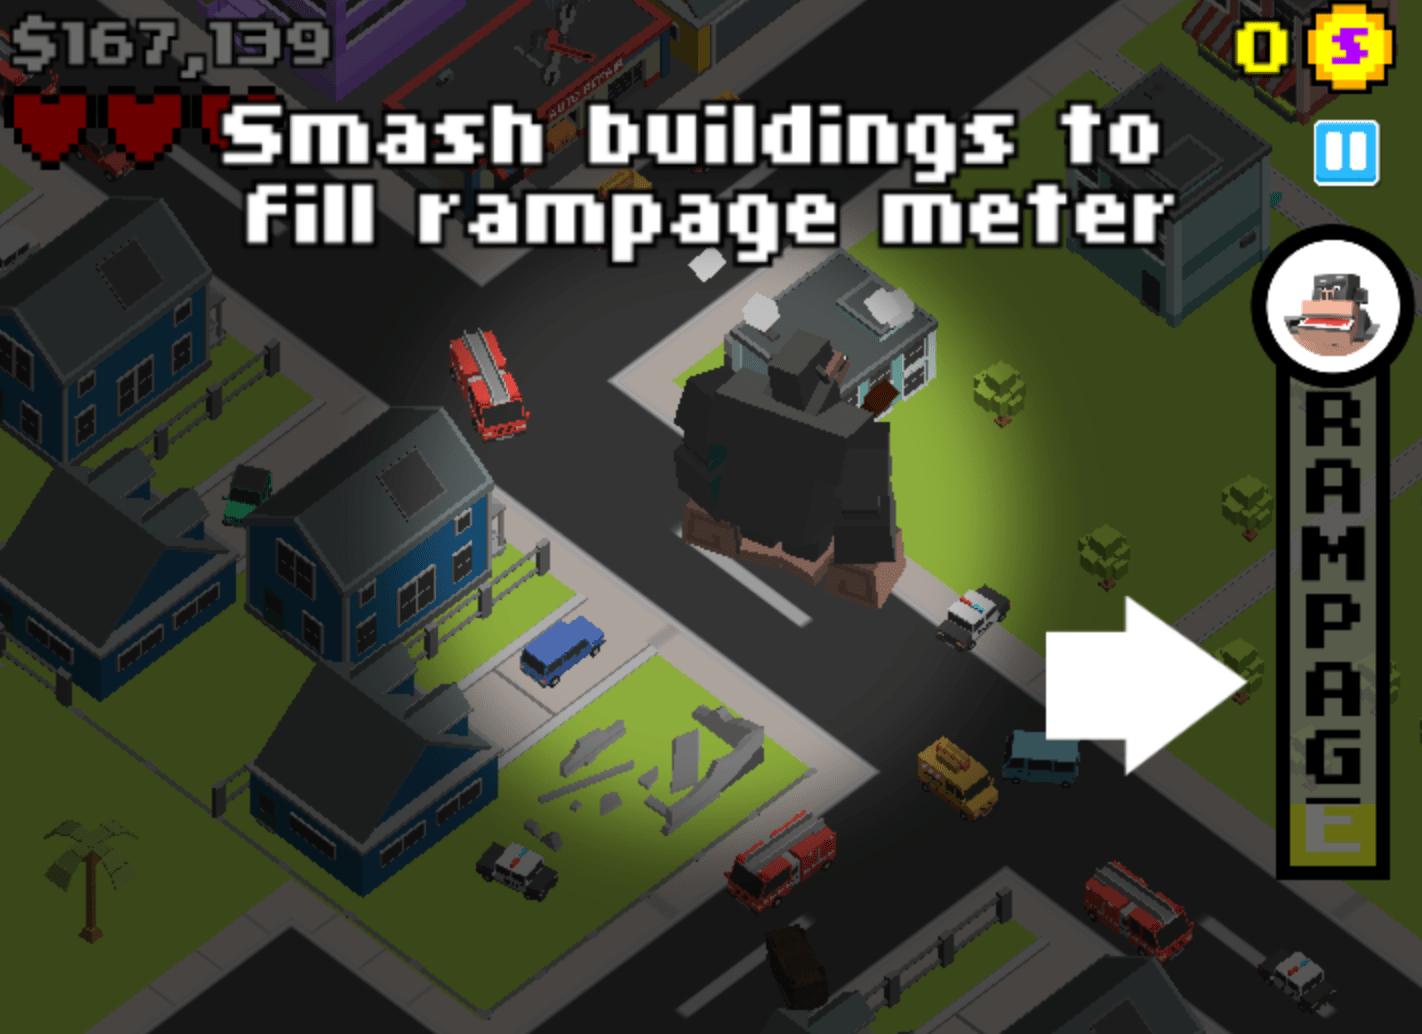 smash city - smash city